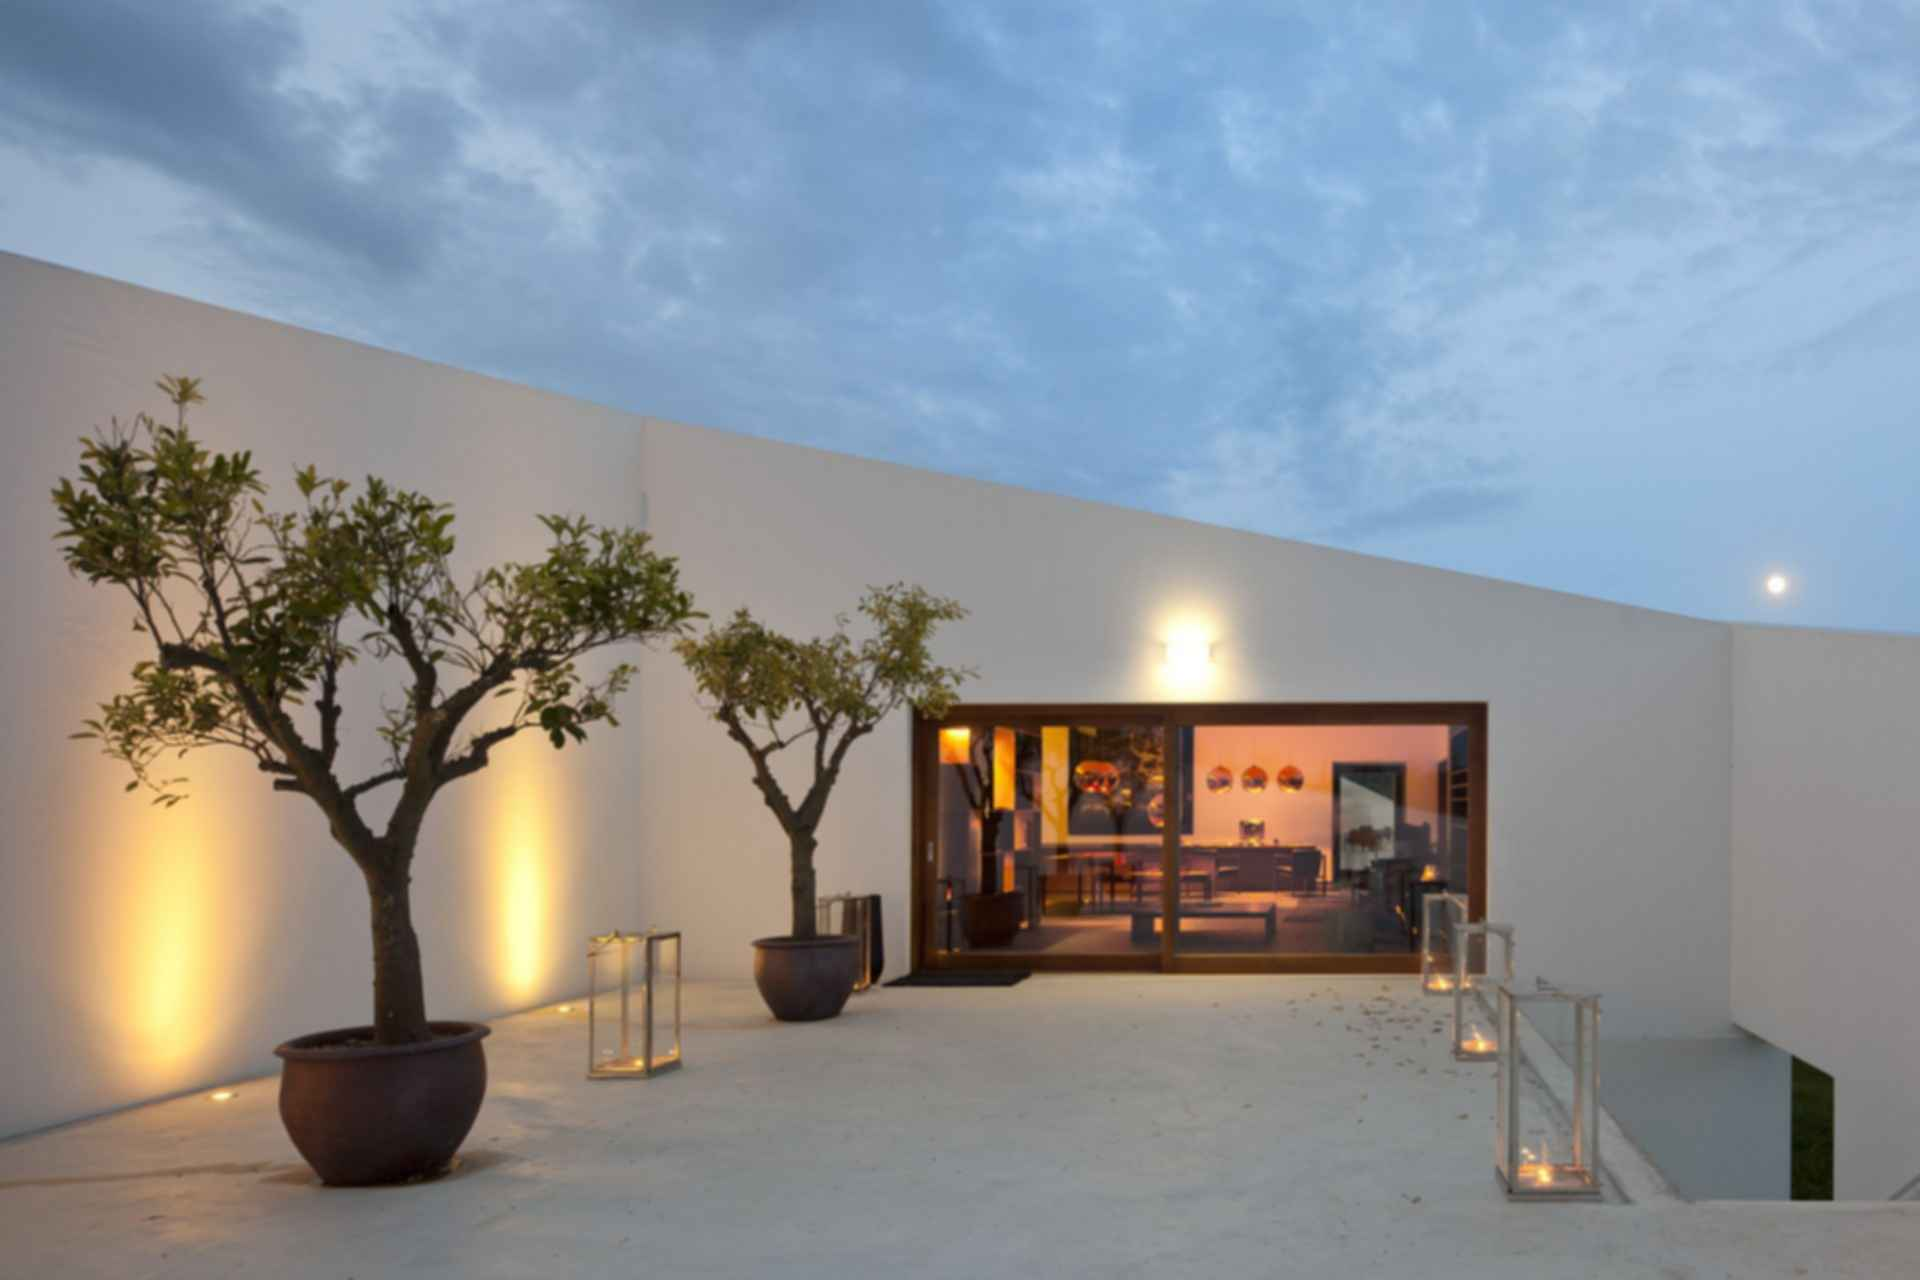 Ecork Hotel - Outdoor Area/Entrance